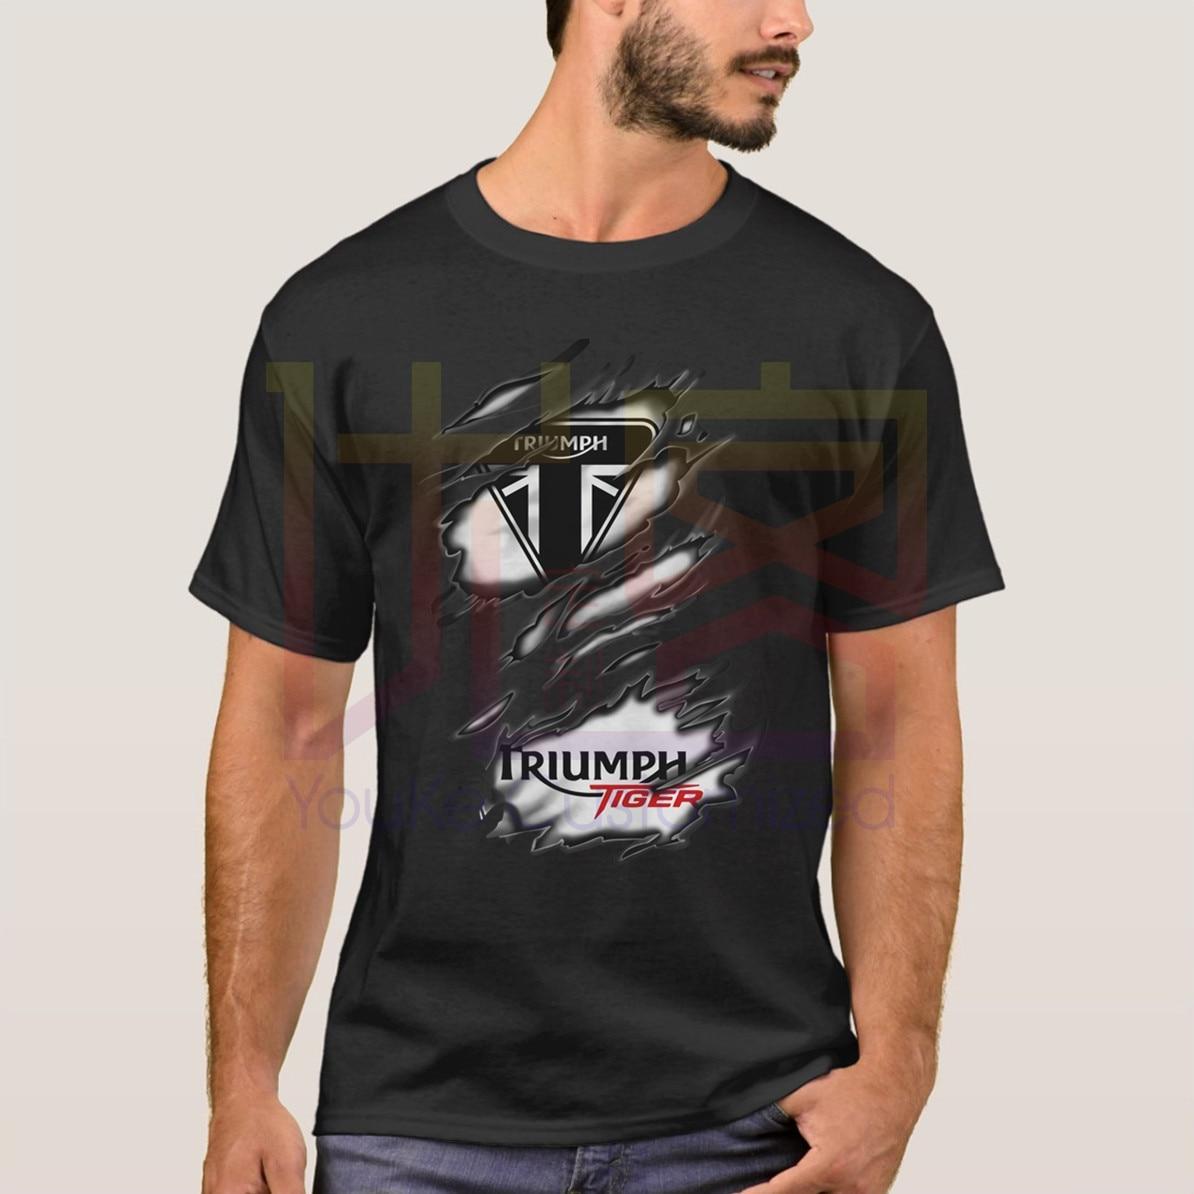 Camiseta 2019 a la moda para hombre, camiseta Popular Ra Triumph Tiger, Camiseta de algodón con cuello redondo 100%